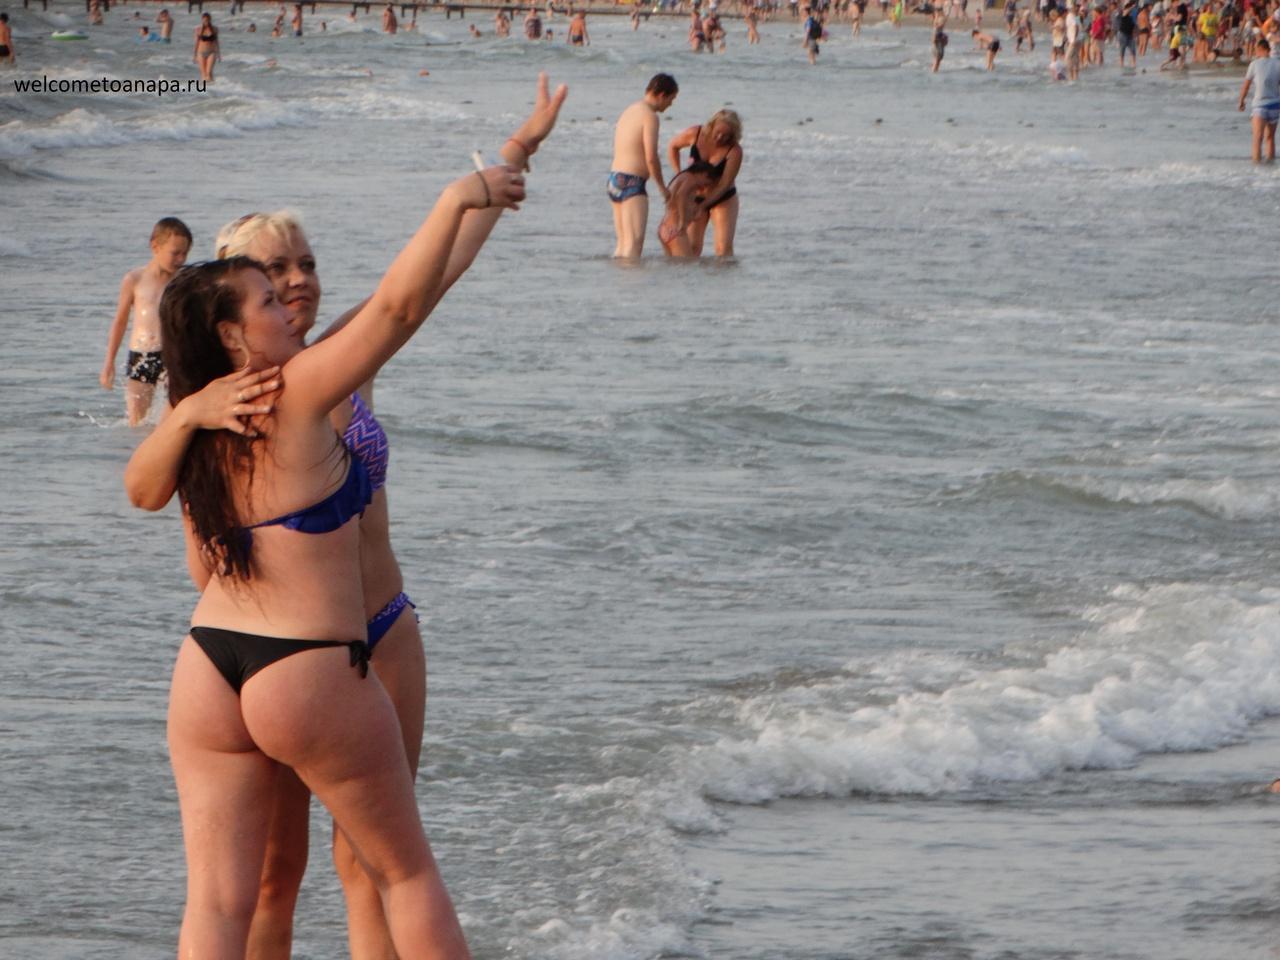 Фото нудийского пляжа людей 2018г